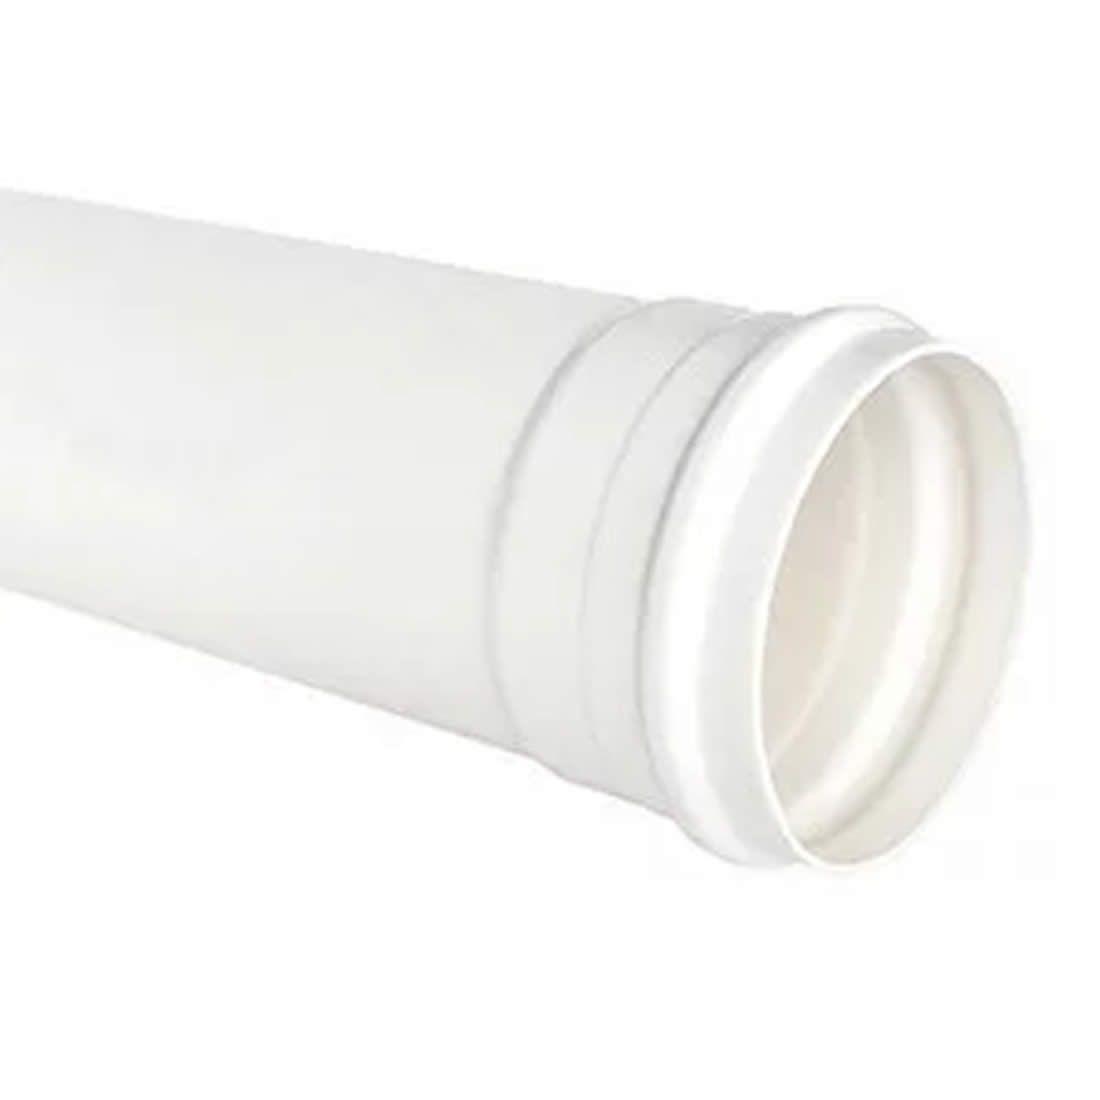 Tubo PVC Para Esgoto 200mm X 6 Metros Tigre